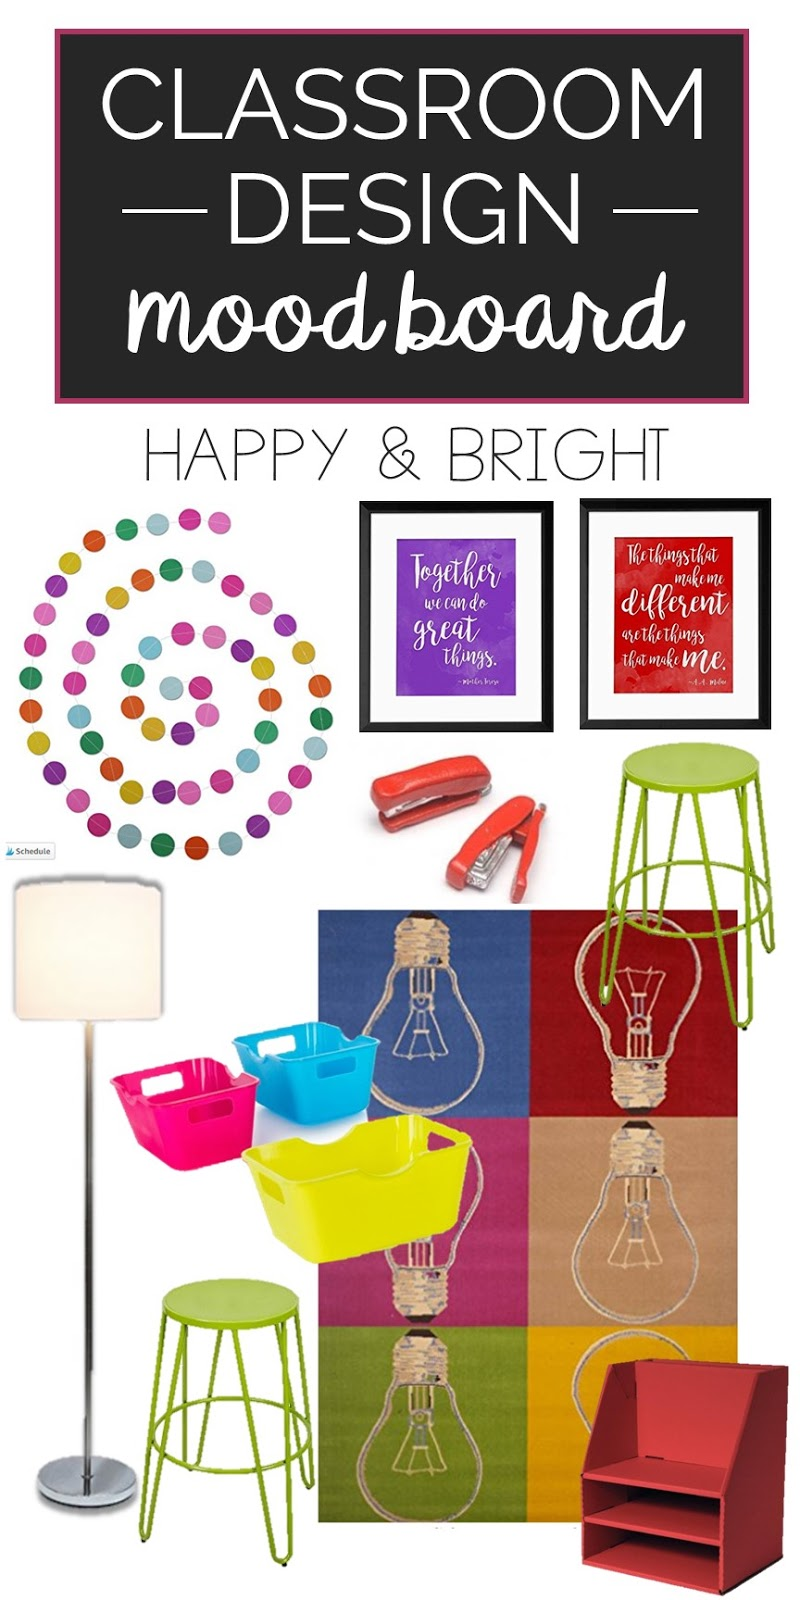 Classroom Decor Items : Brain waves instruction bright and bold classroom decor ideas